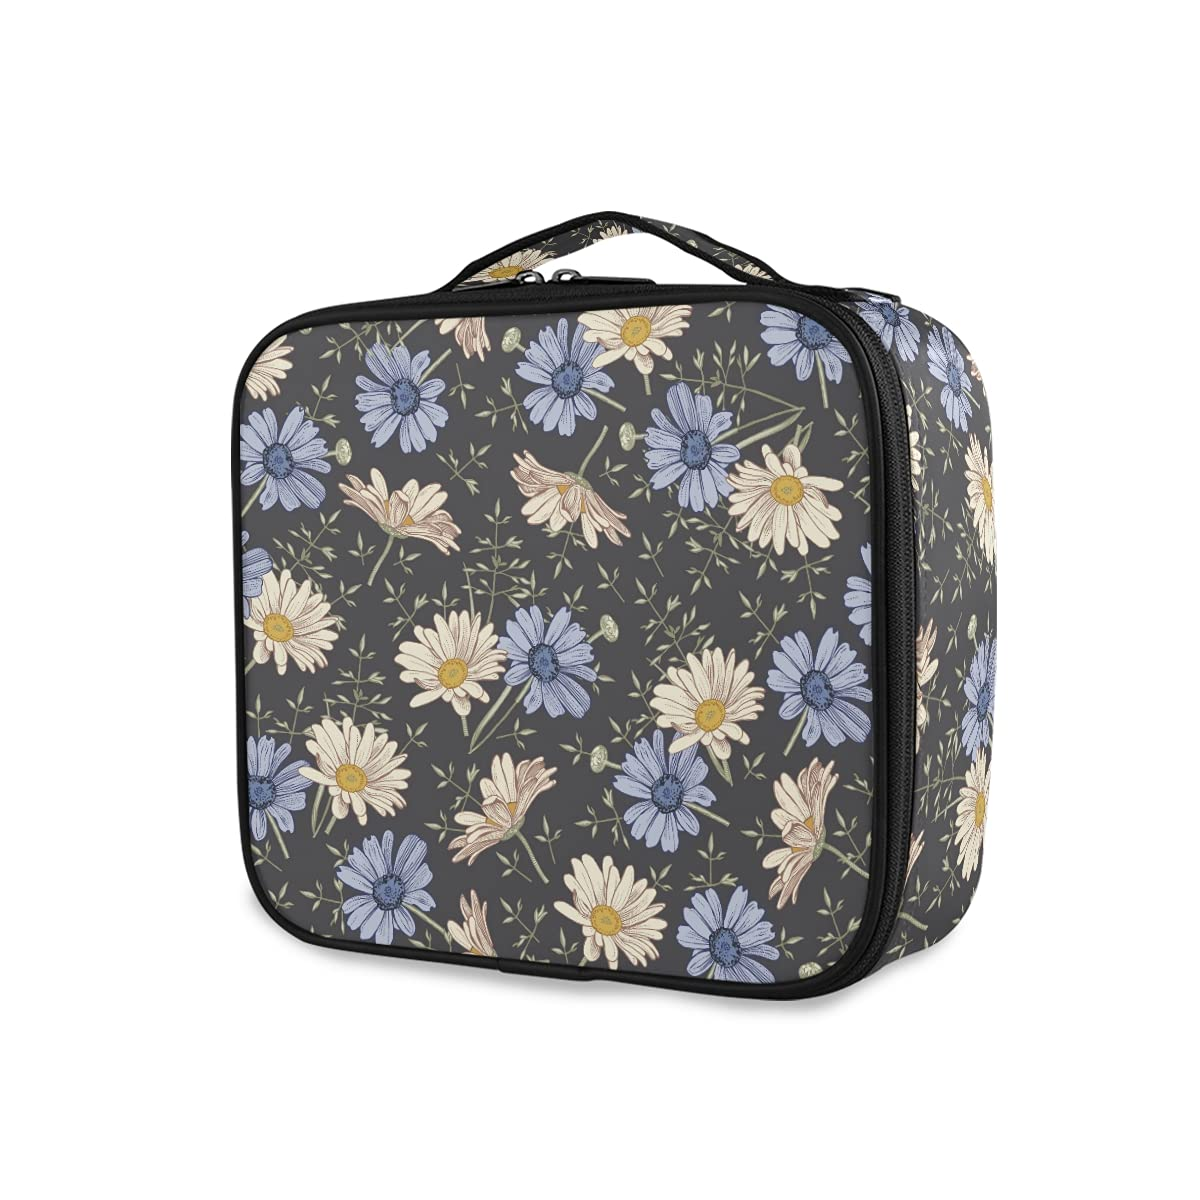 OTVEE Whtie A surprise price is realized Daisy Vintage Regular dealer Wildflowers Makeup Travel Cosmetic Bag